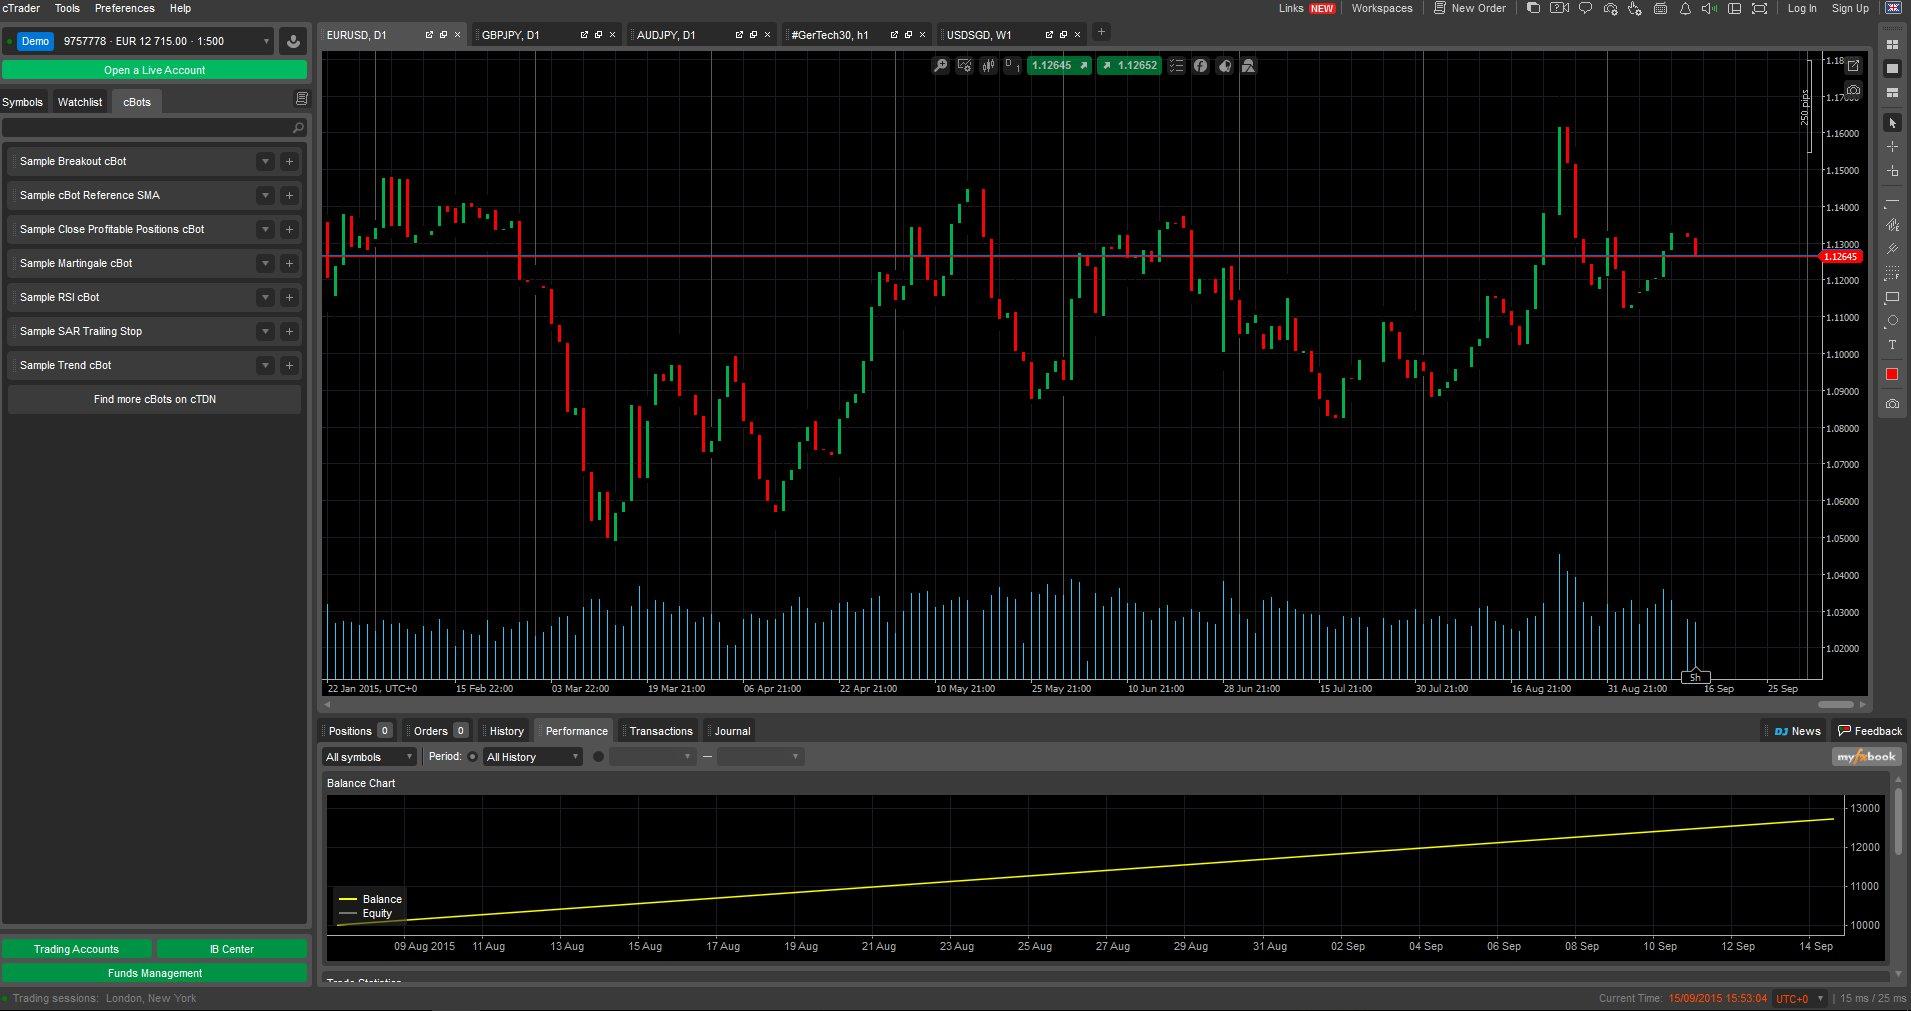 Mejor plataforma de trading forex